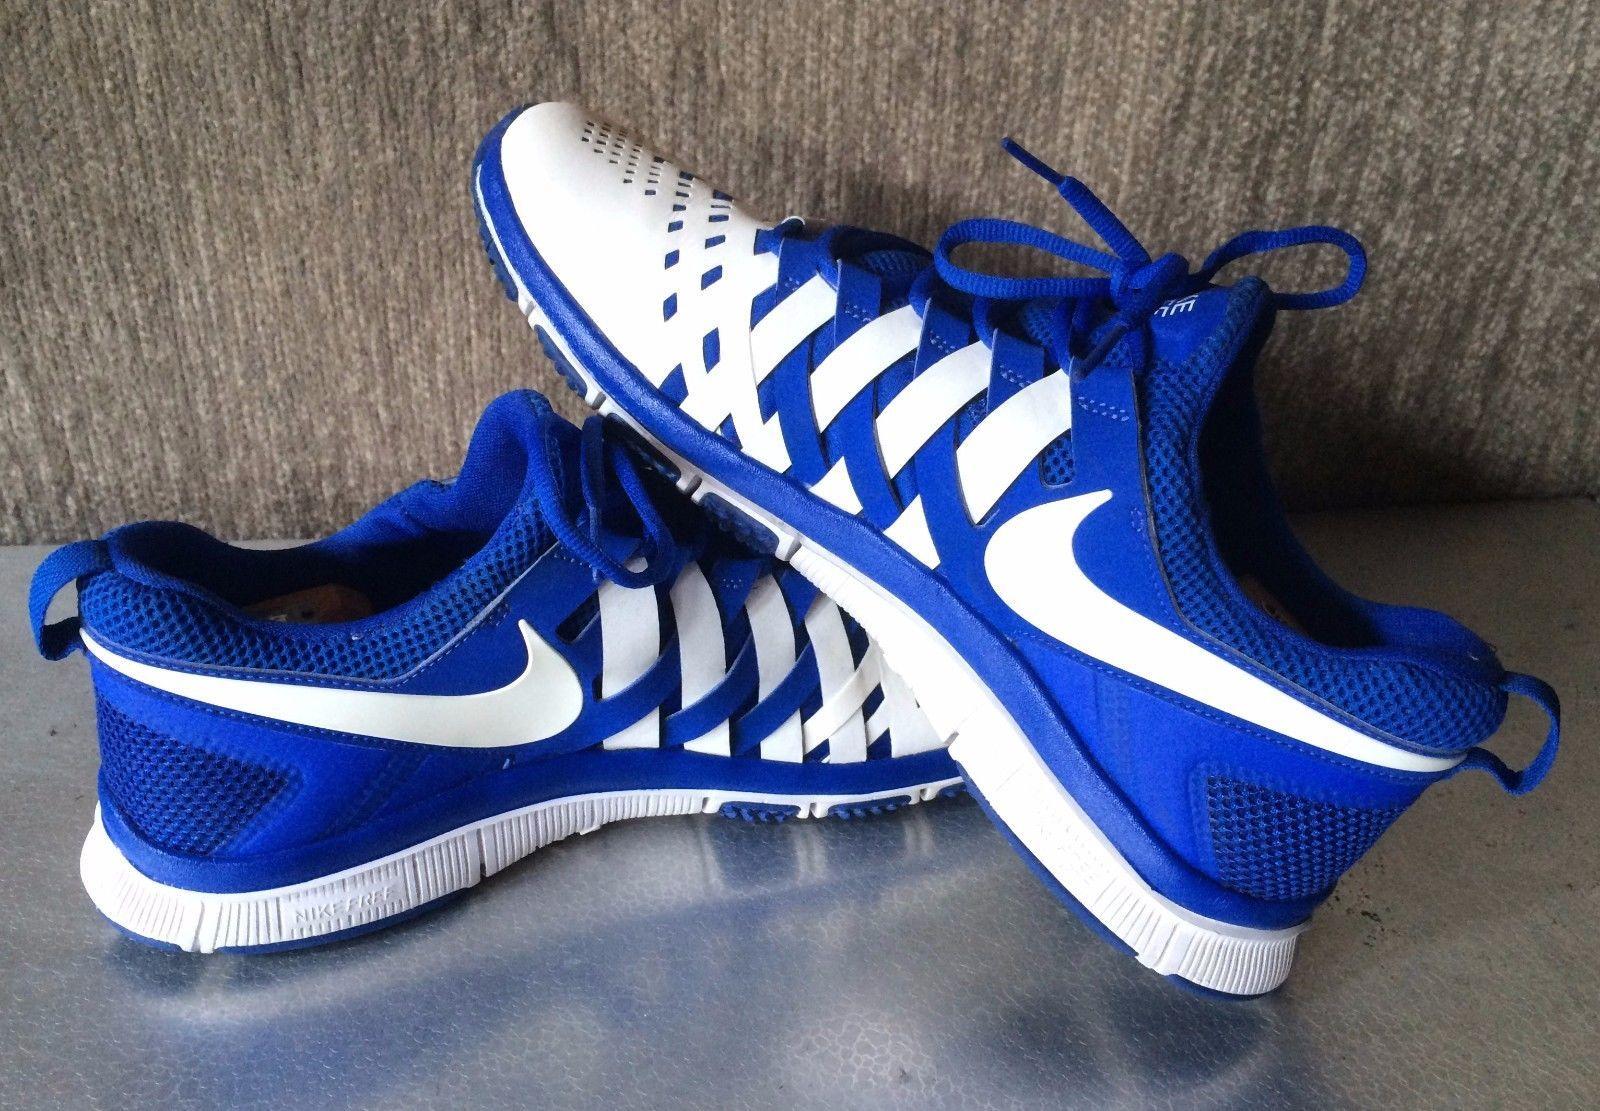 Nike Free 5.0 Fingertrap Trainer Training Shoes Blue & White